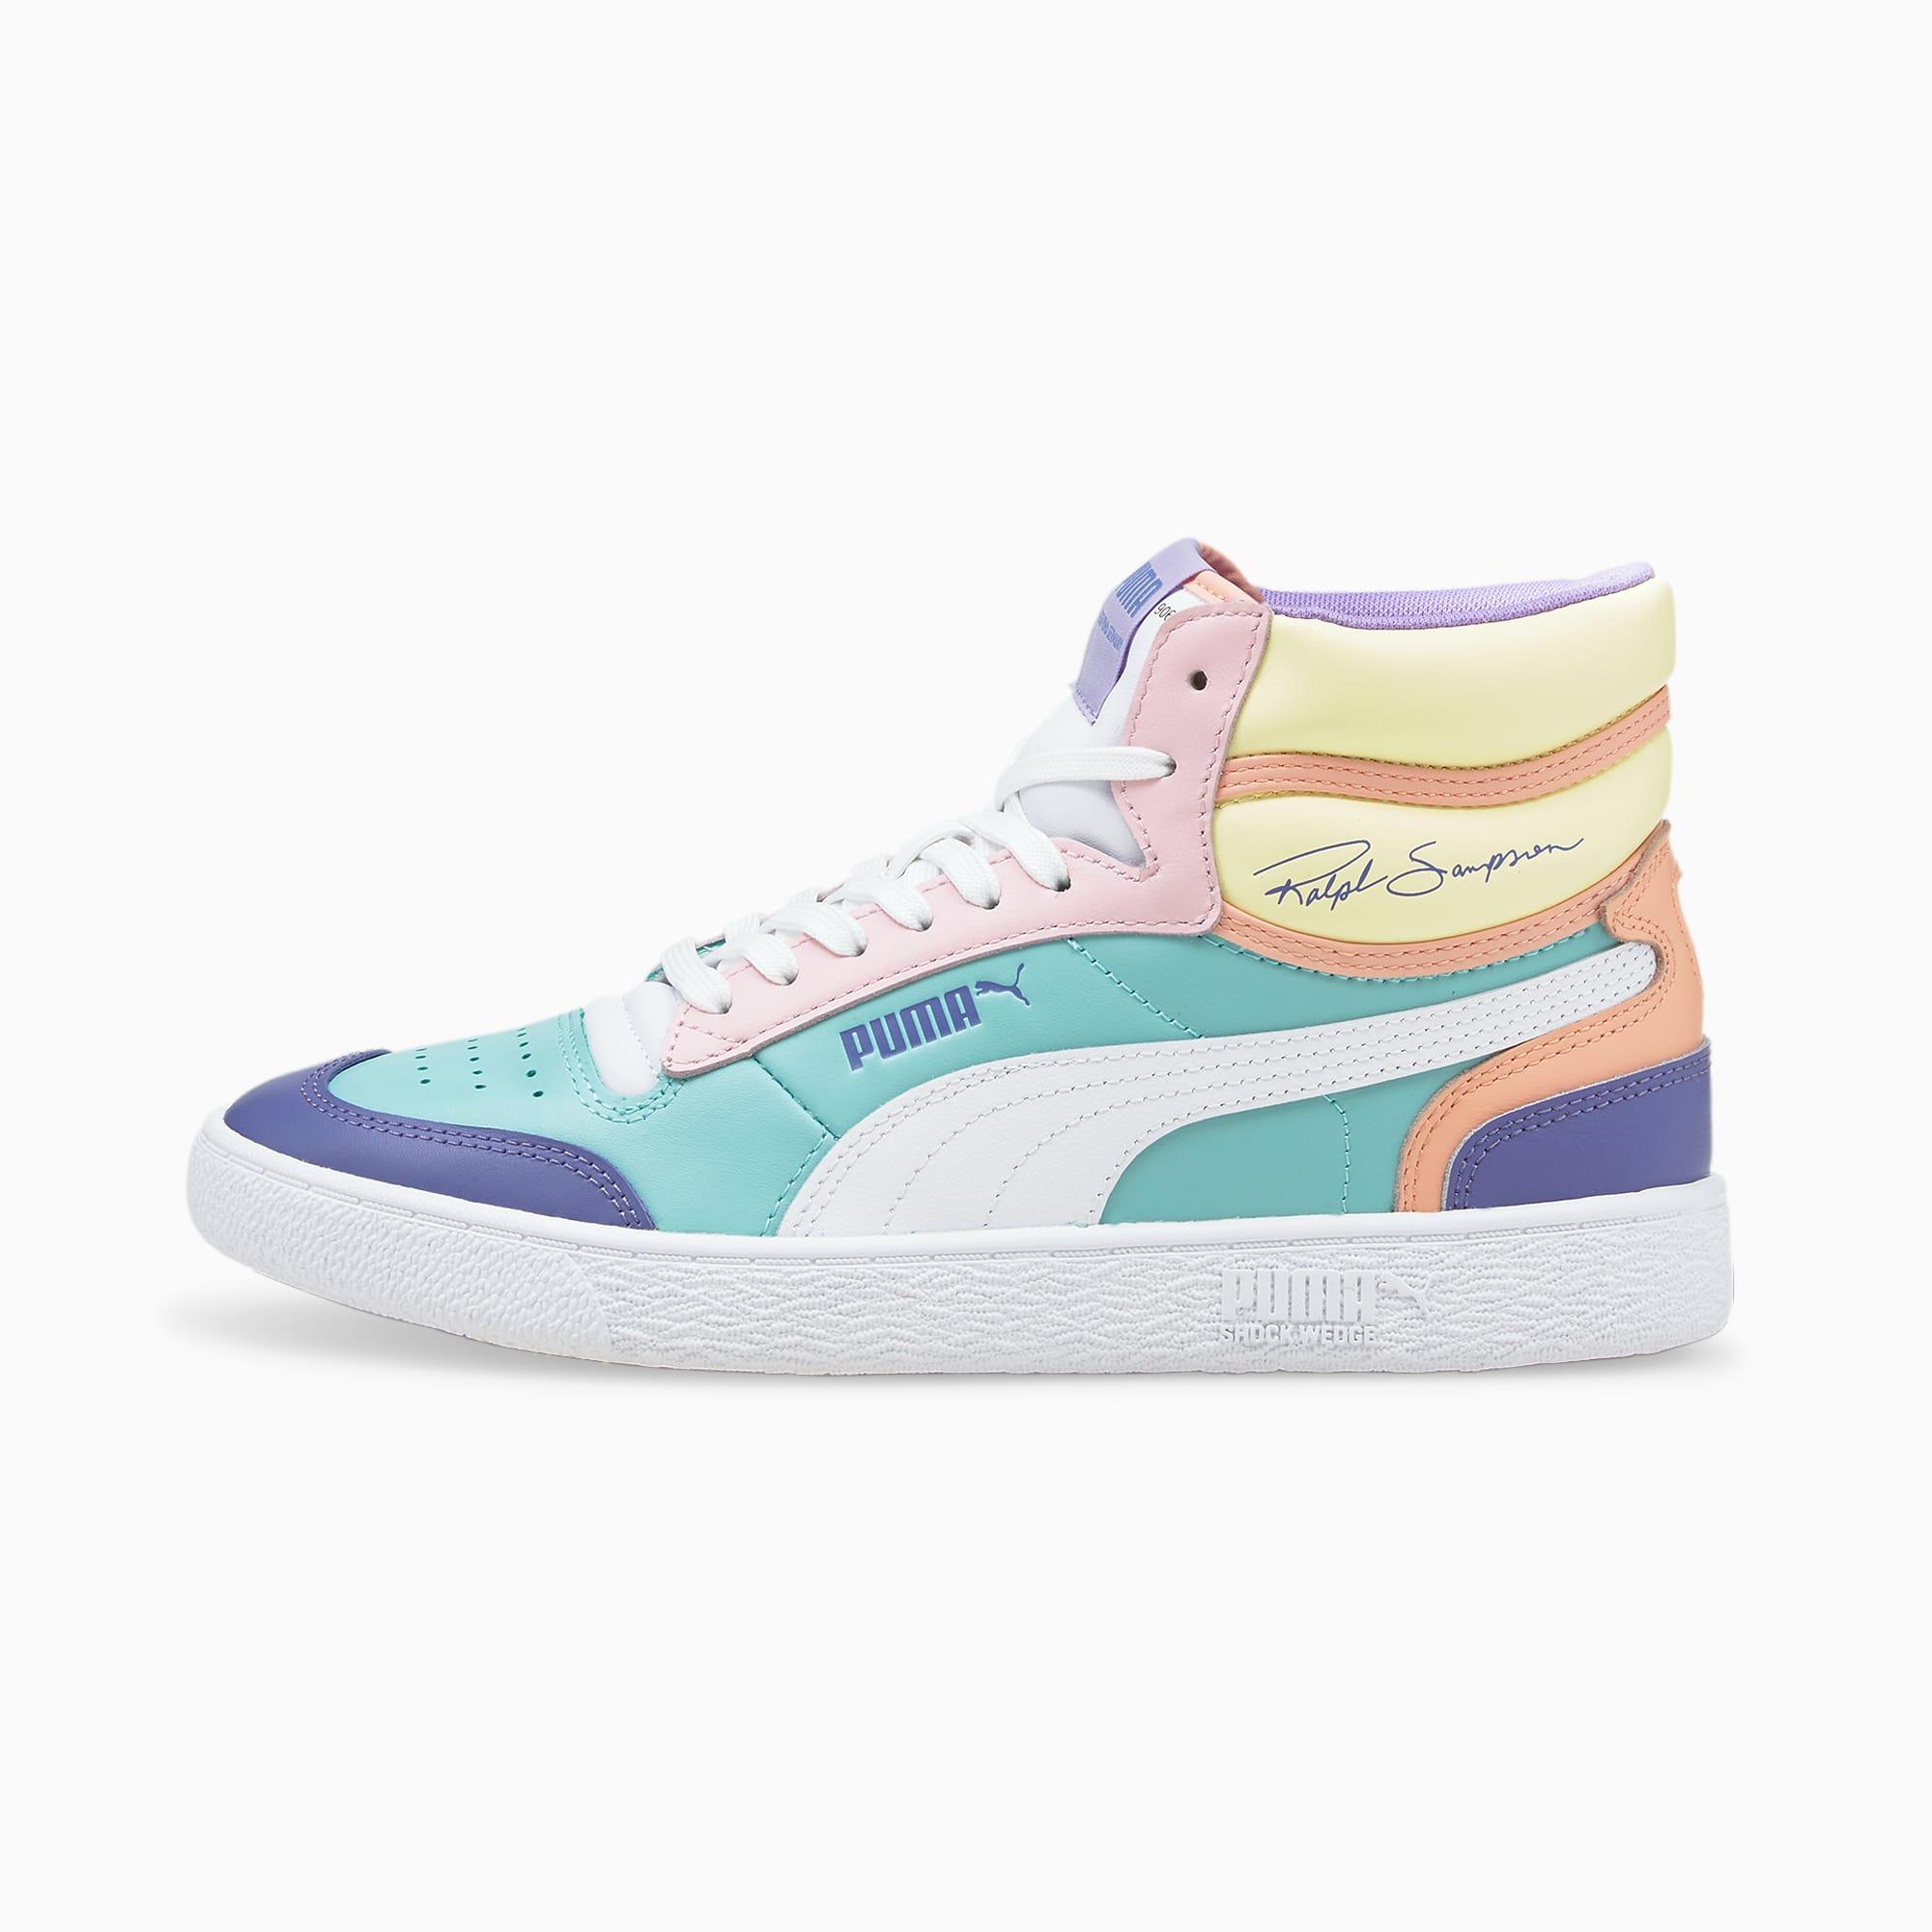 PUMA x Ralph Sampson Mid Sneaker Schuhe   Mit Aucun   Blau/Rosa/Weiß   Größe: 44.5